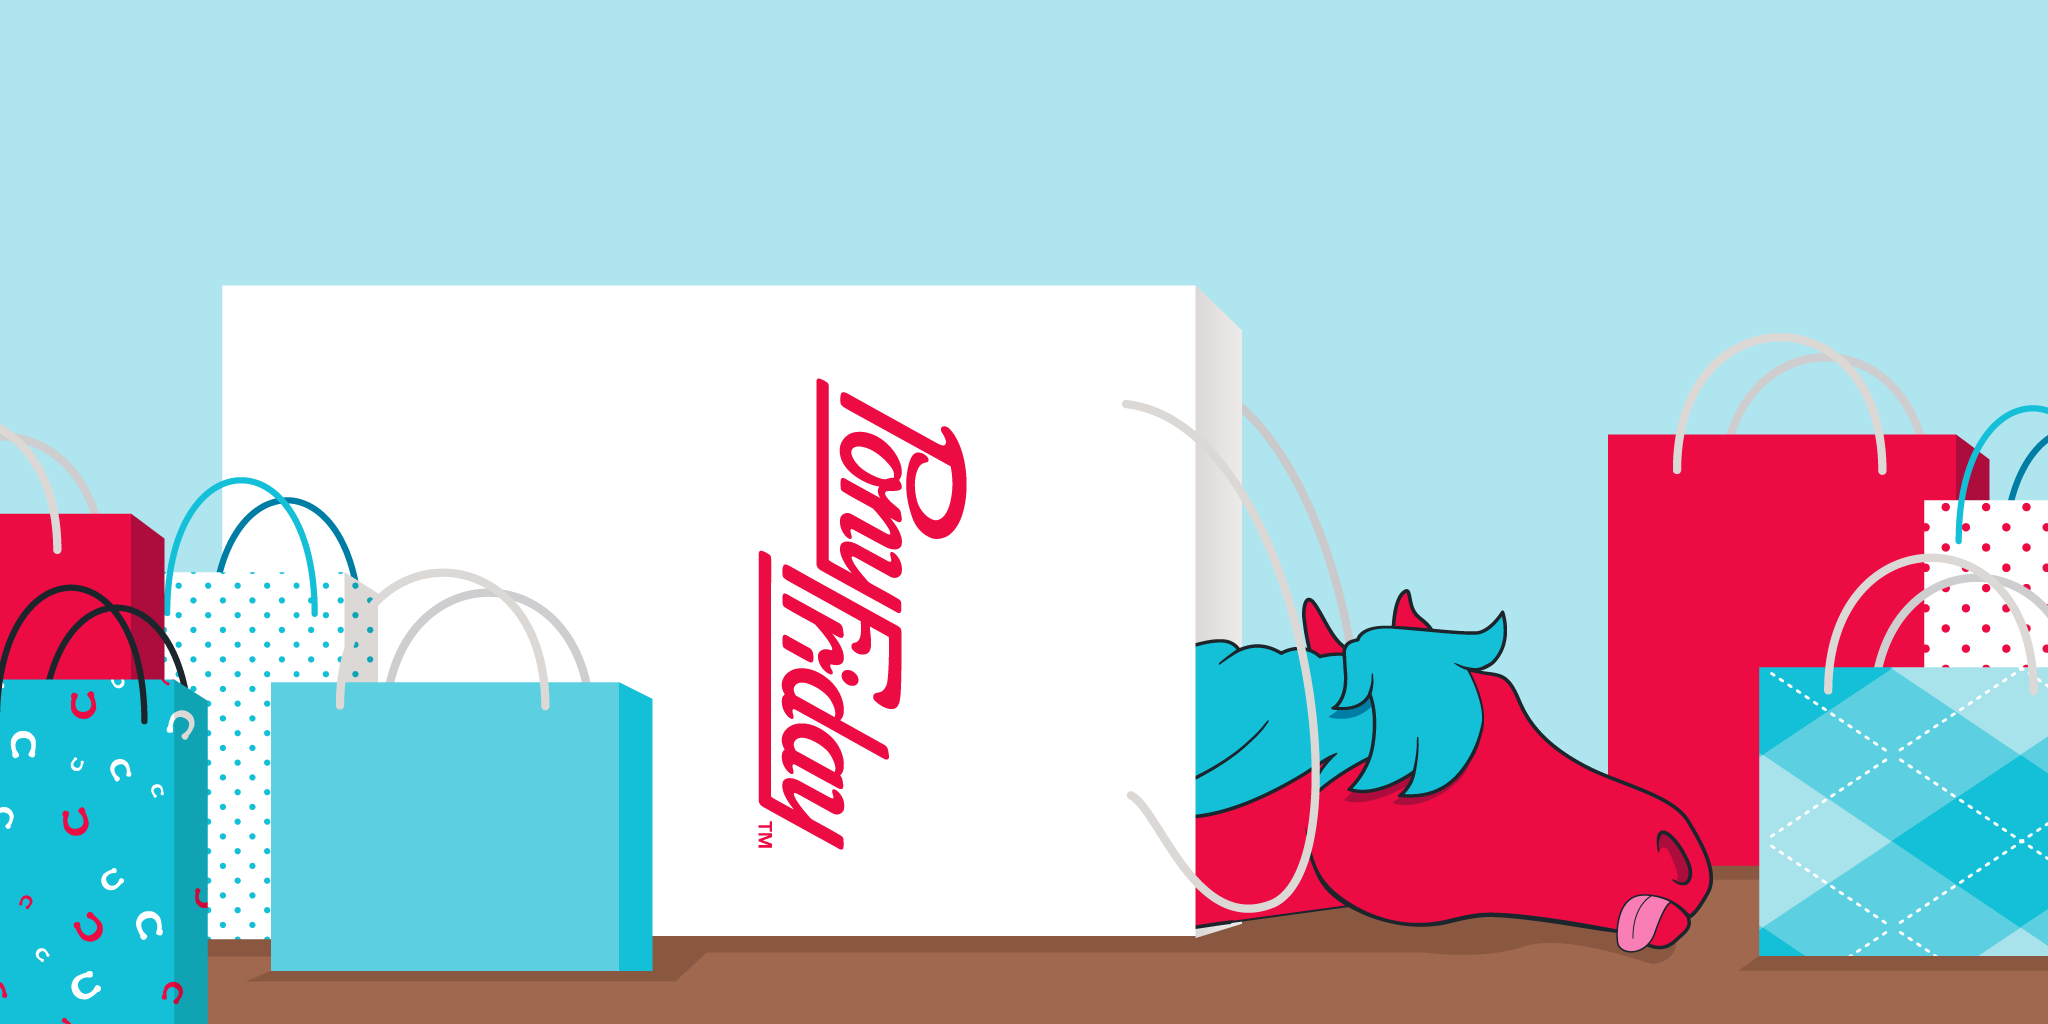 Pony-Friday-Shopping-Shop-Til-You-Drop-Fatigue-Second-Wind-Blog-Header.png